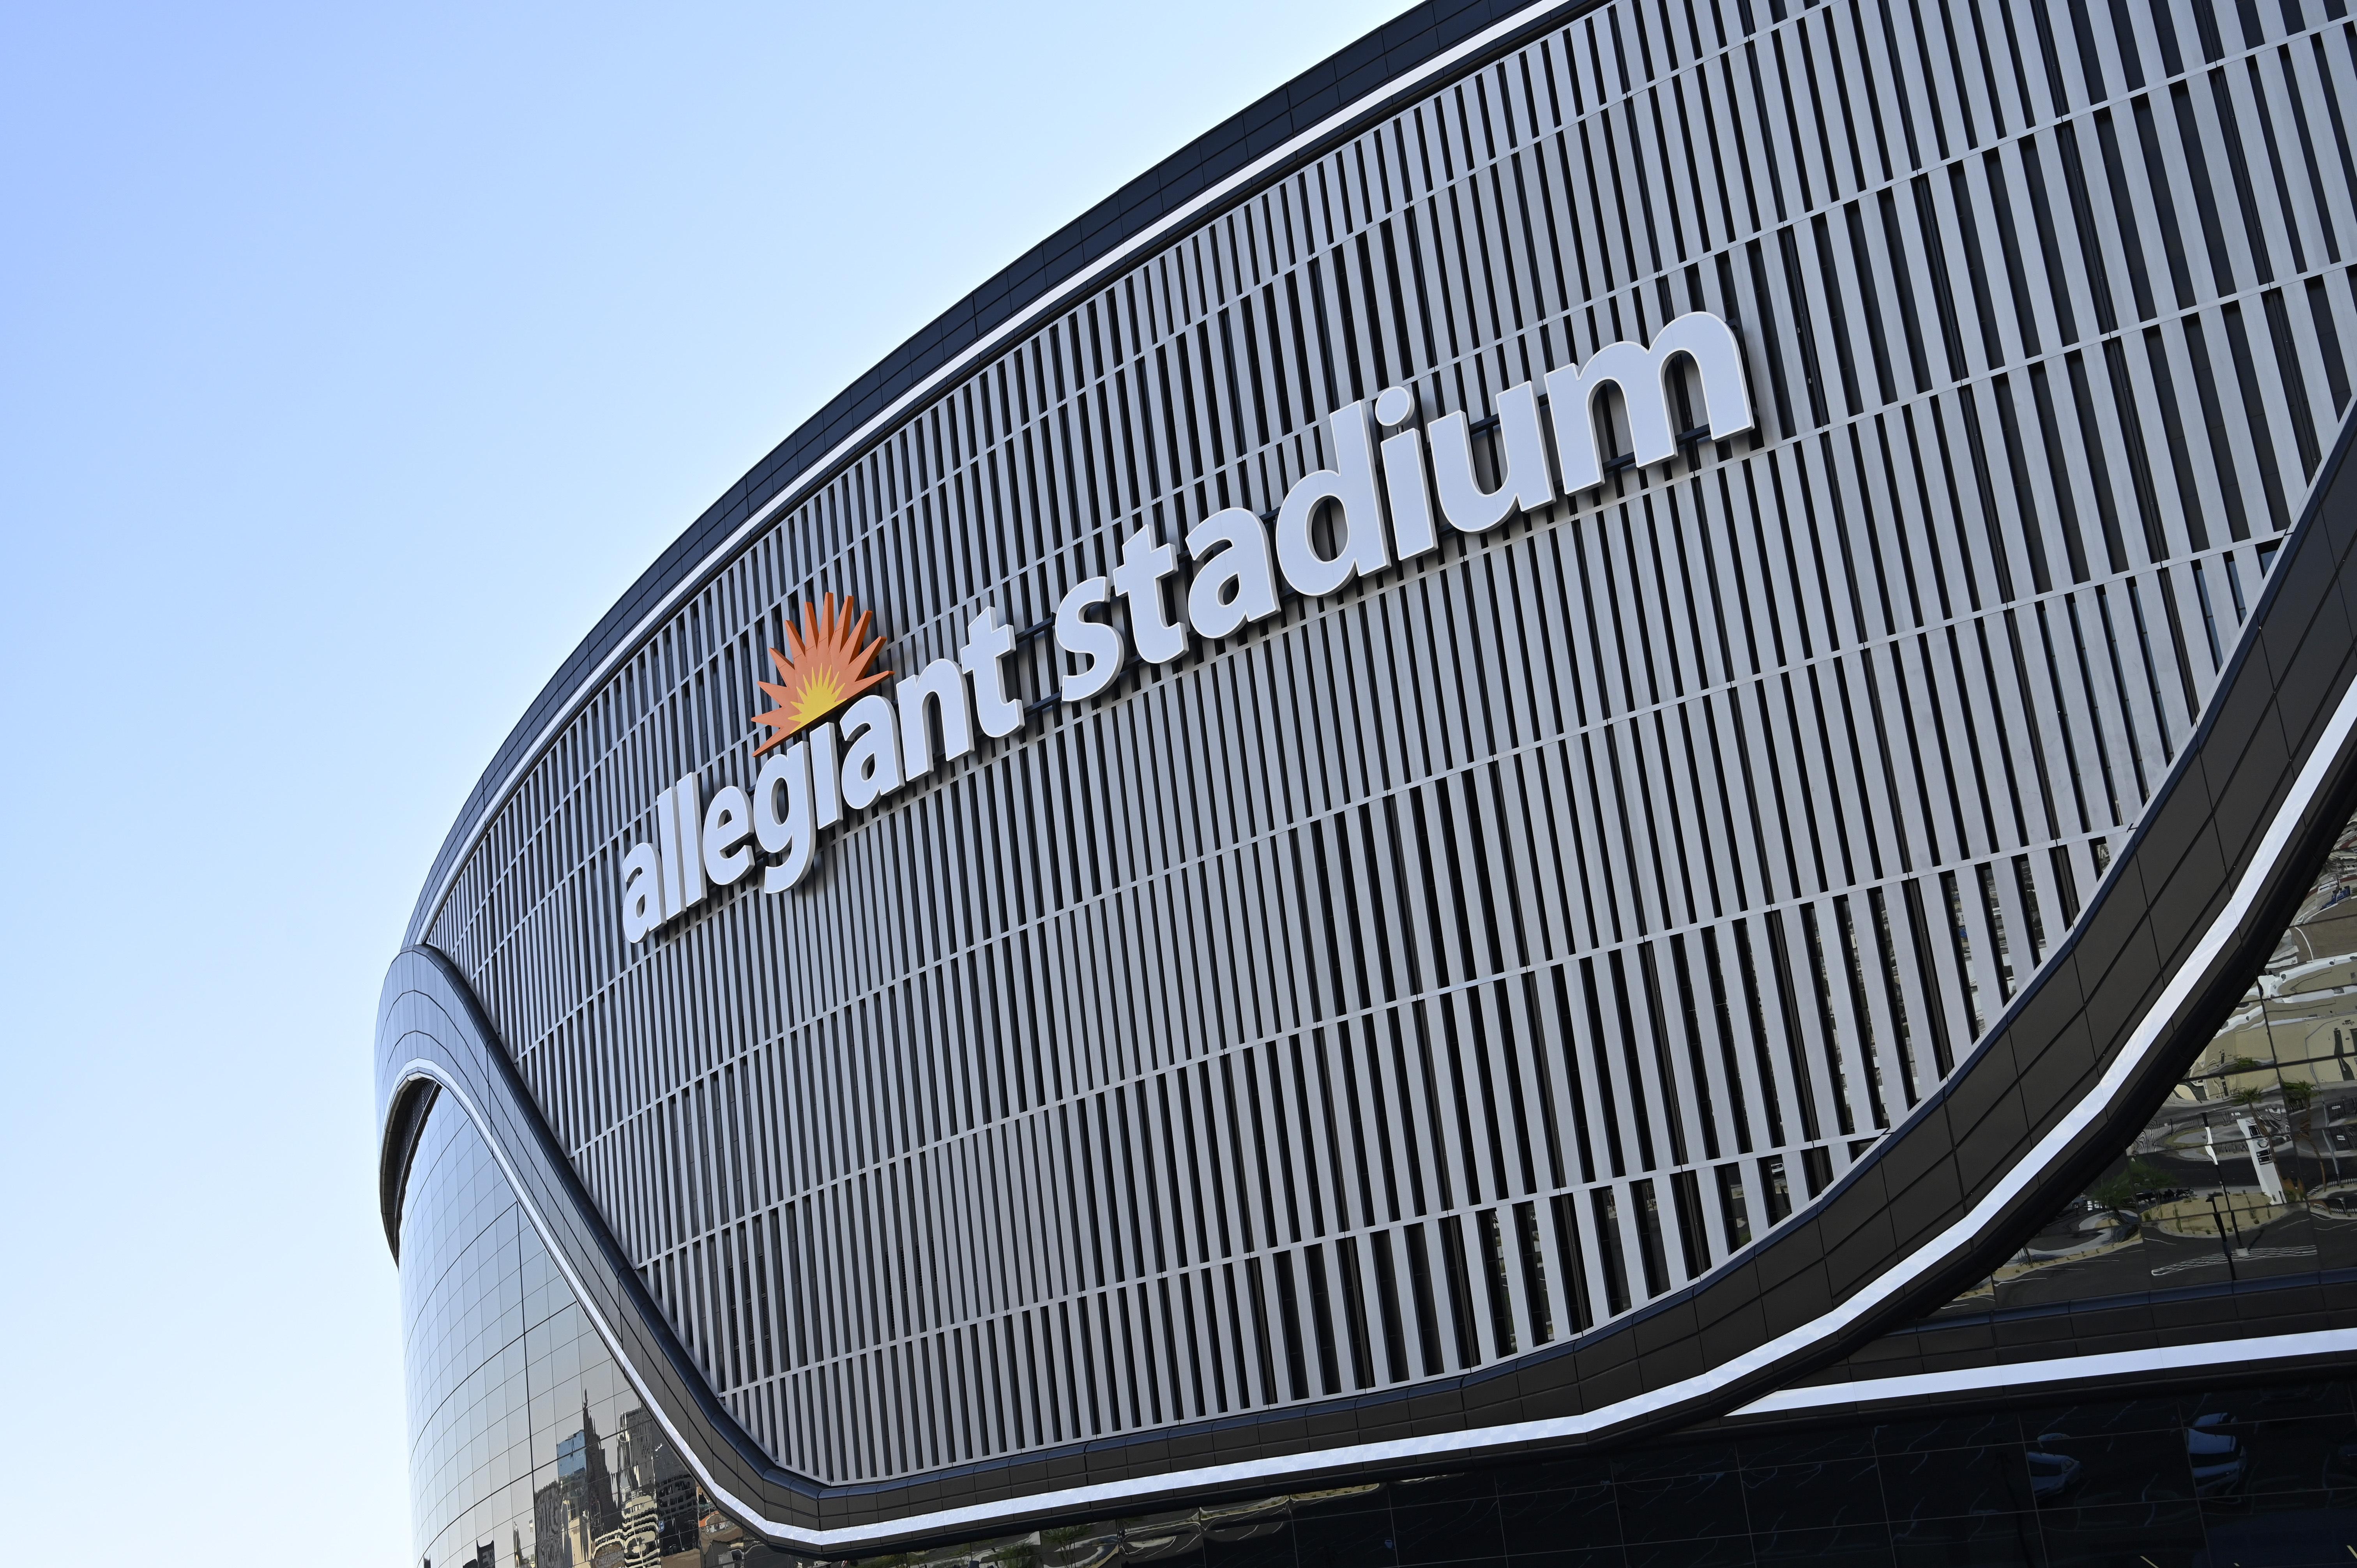 Allegiant Stadium in Las Vegas will host the Notre Dame-BYU game in 2022.